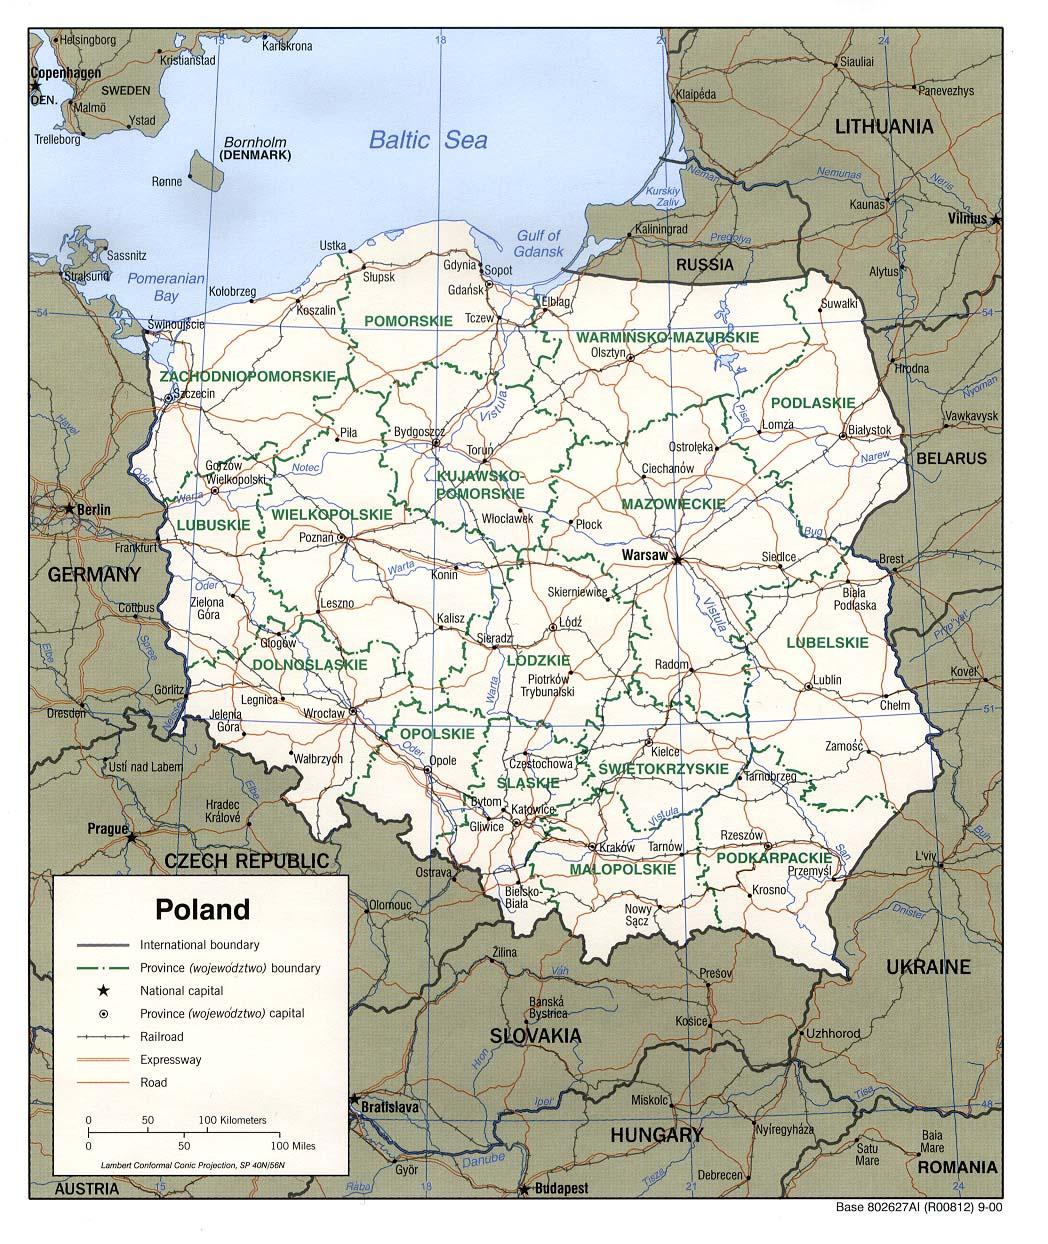 Mapa Político da Polónia